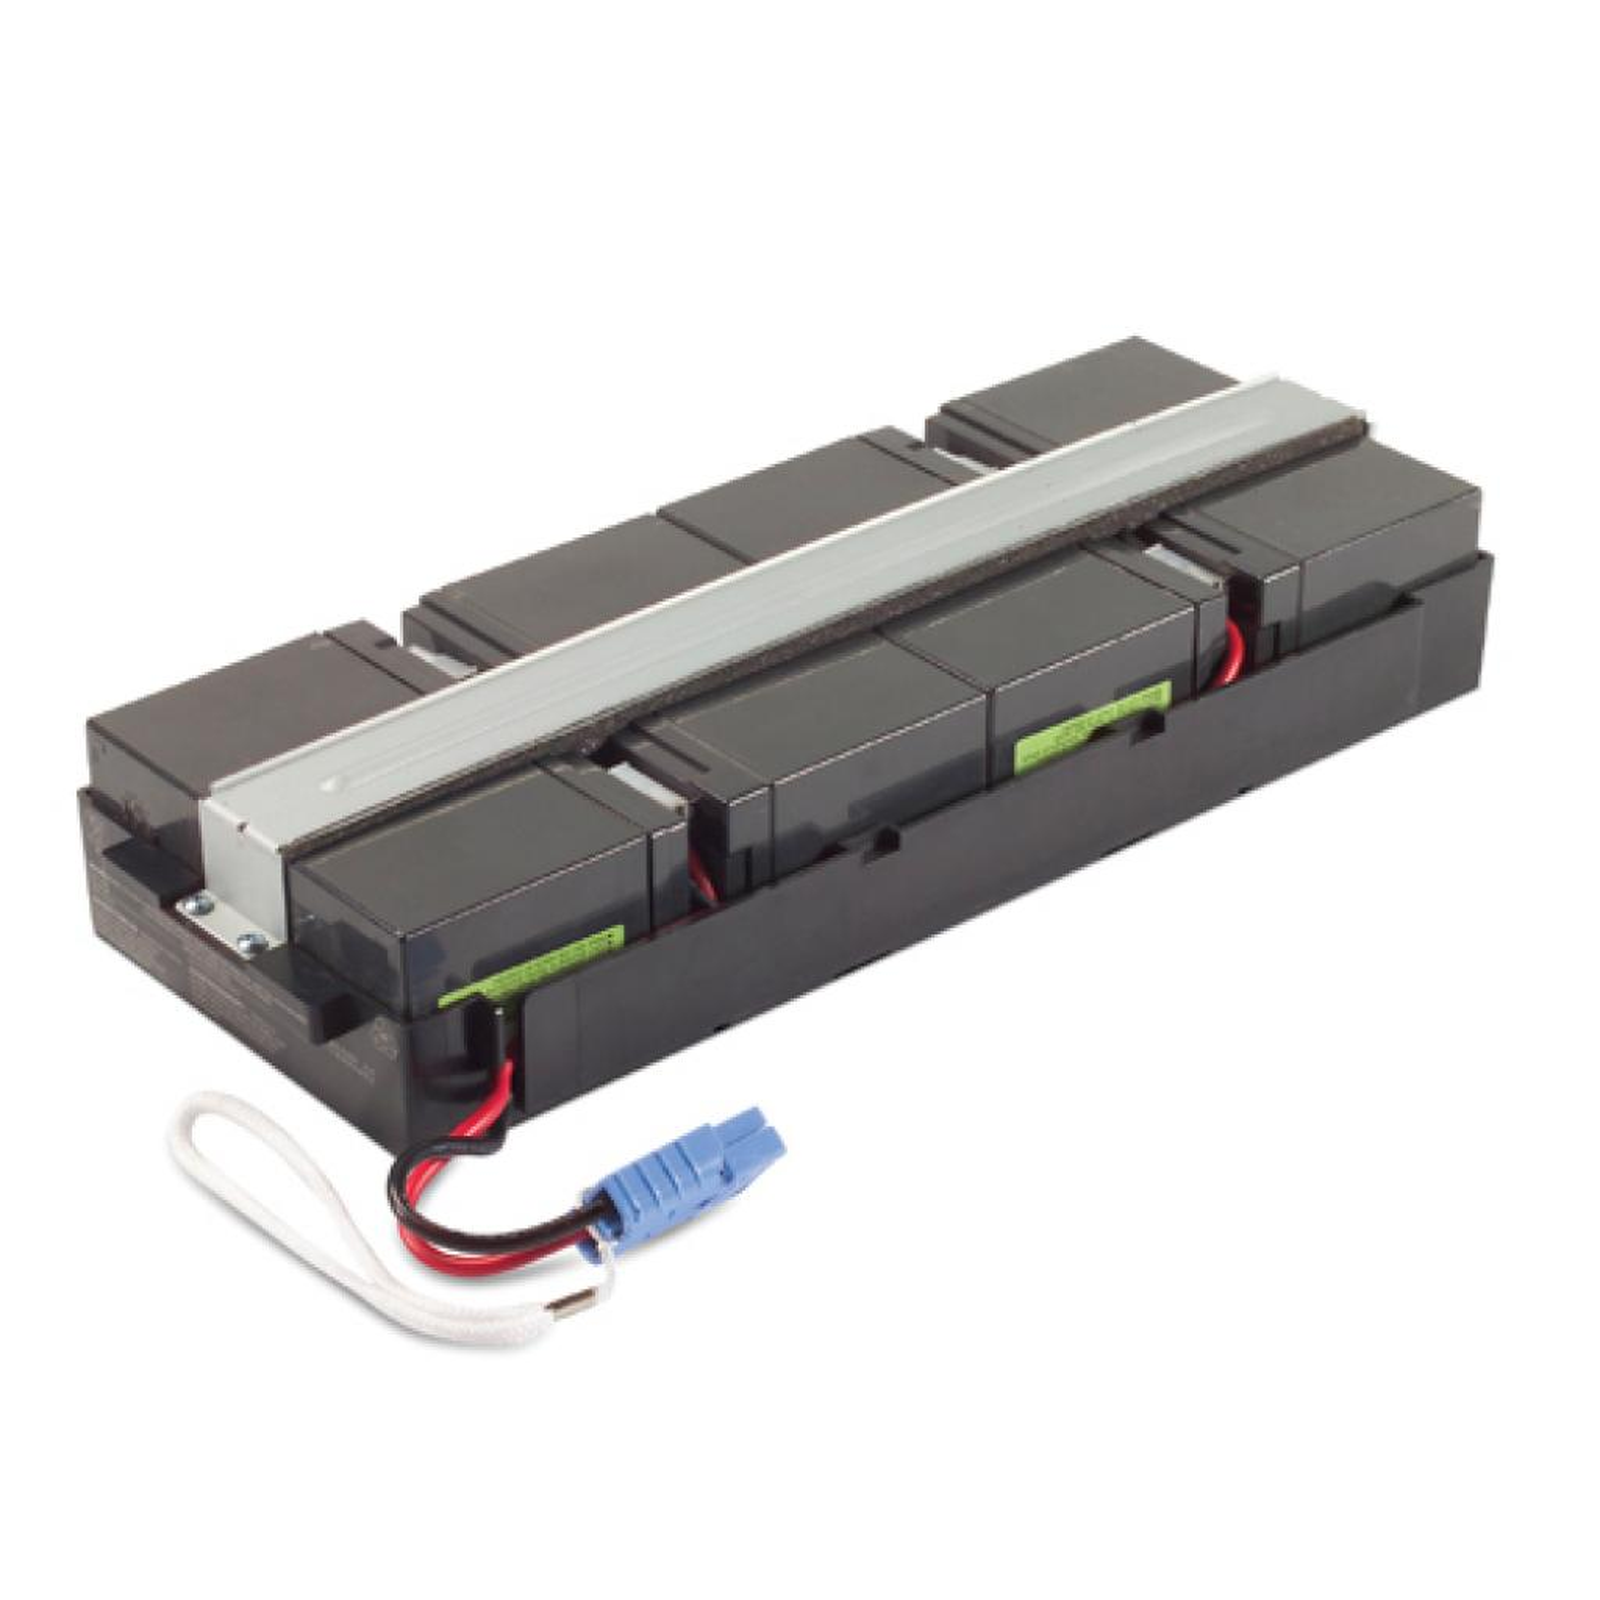 Батарея к ИБП Replacement Battery Cartridge #31 APC (RBC31)